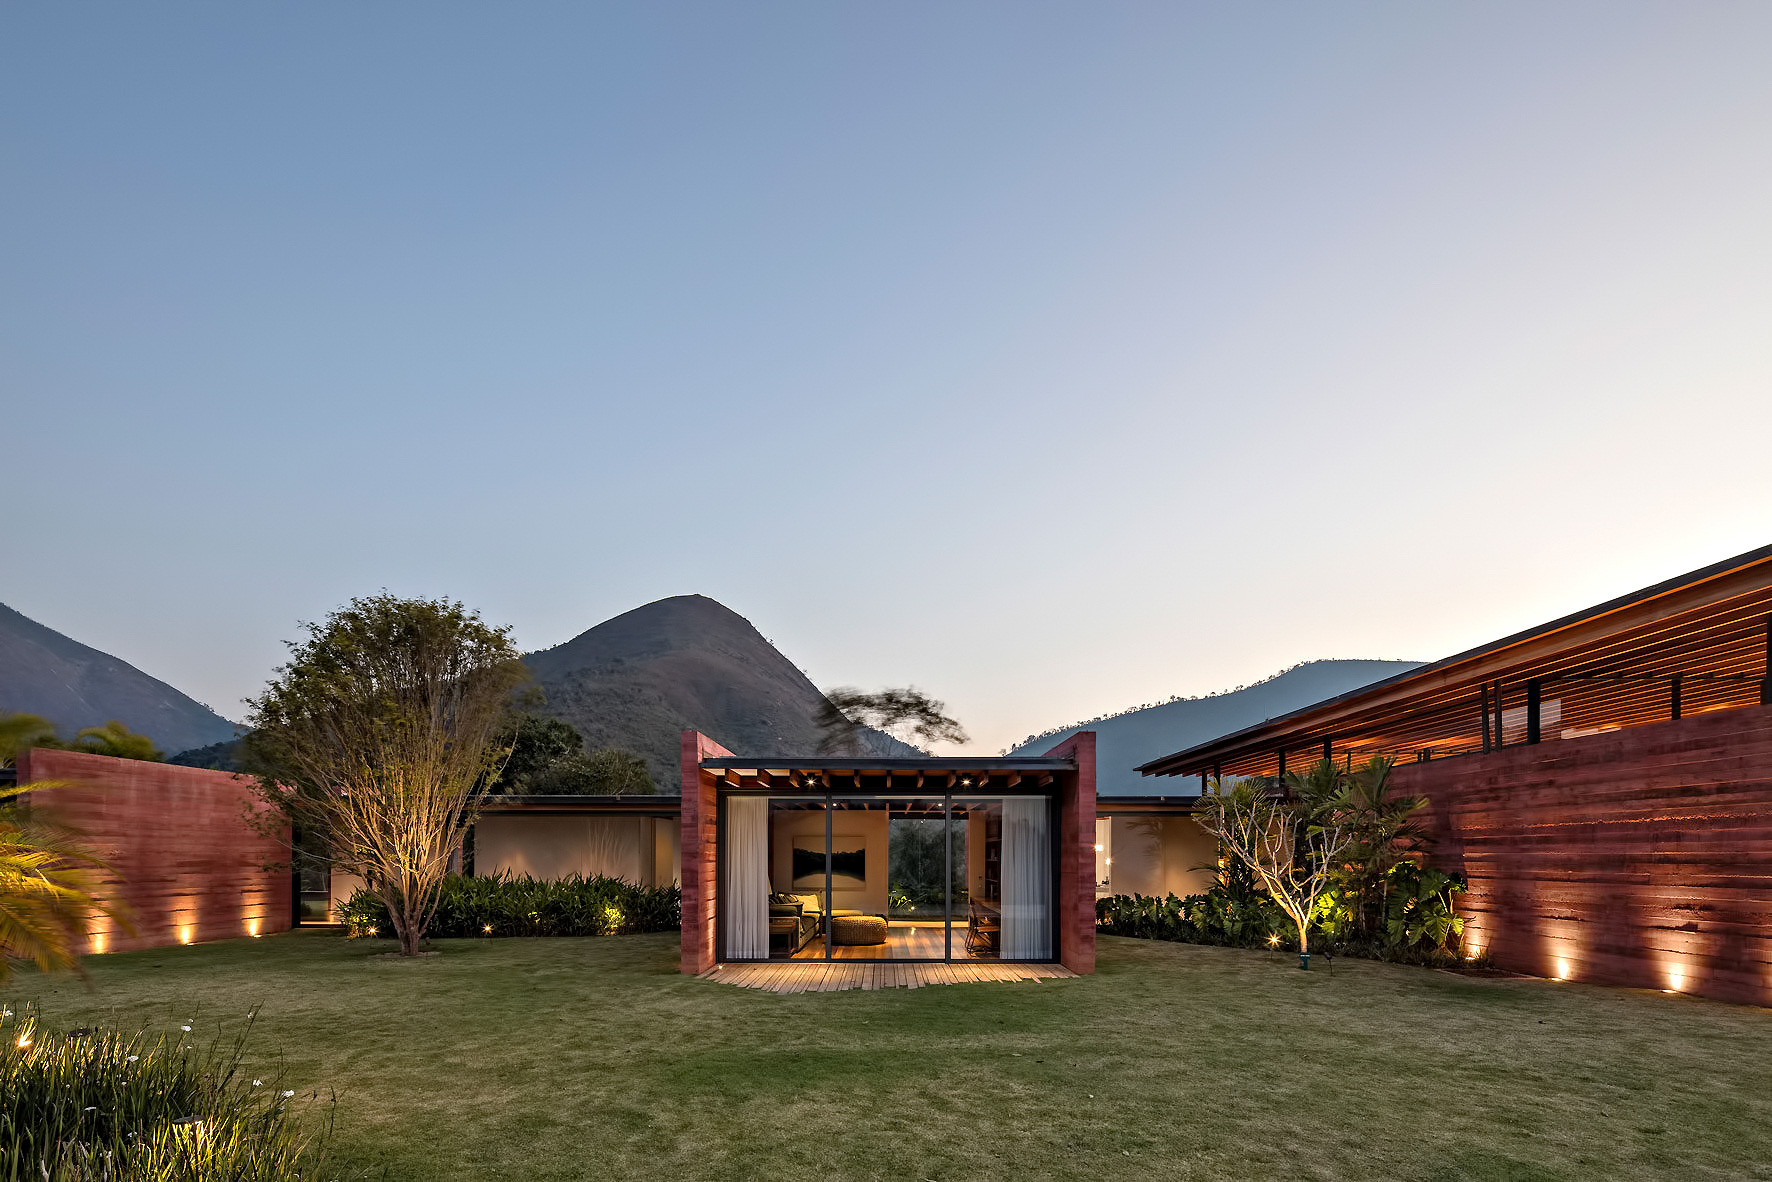 Casa Terra Residence – Itaipava, Petrópolis, Rio de Janeiro, Brazil